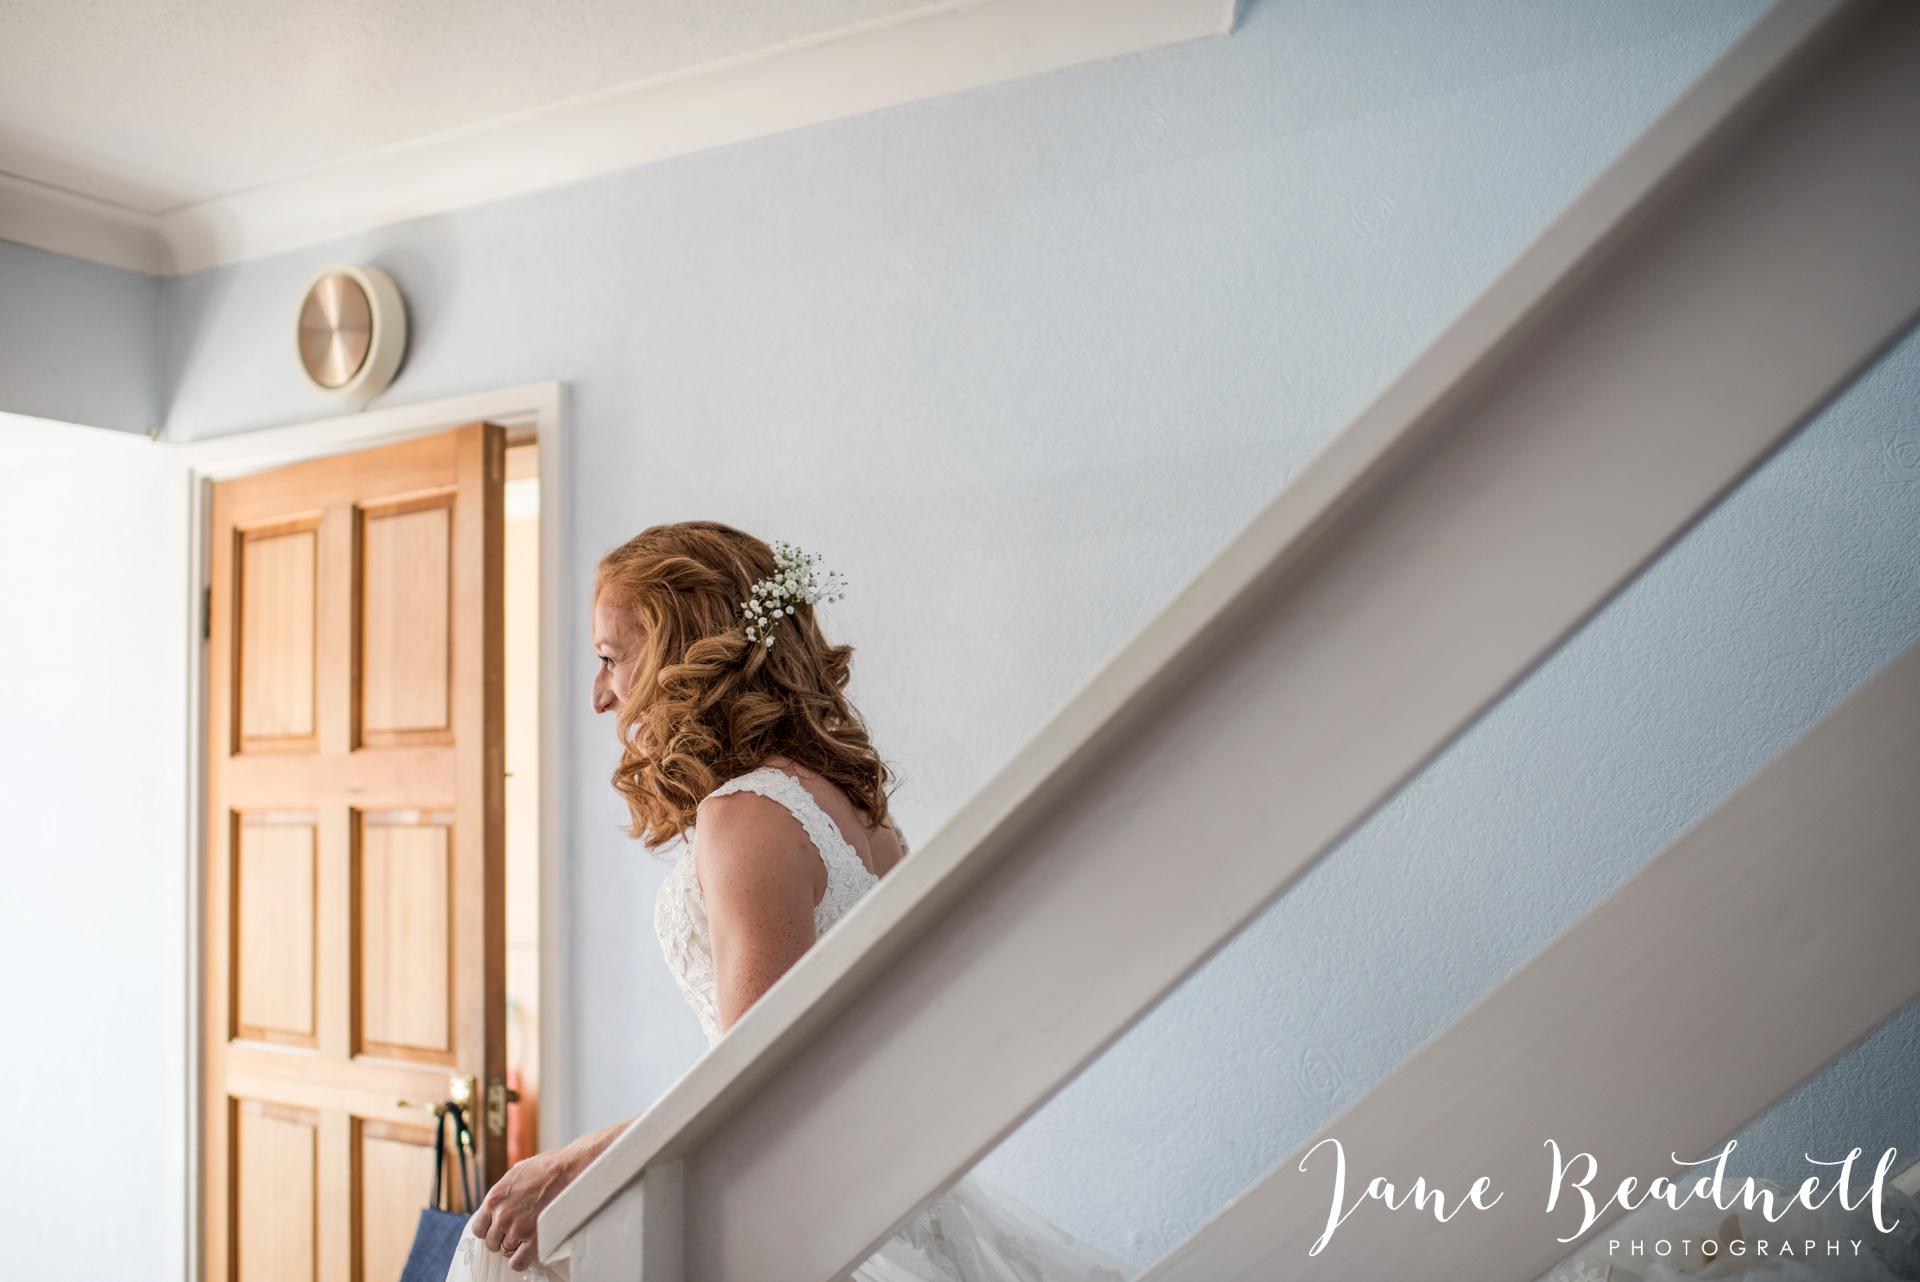 yorkshire-fine-art-wedding-photographer-jane-beadnell-photography-poppleton-york_0012